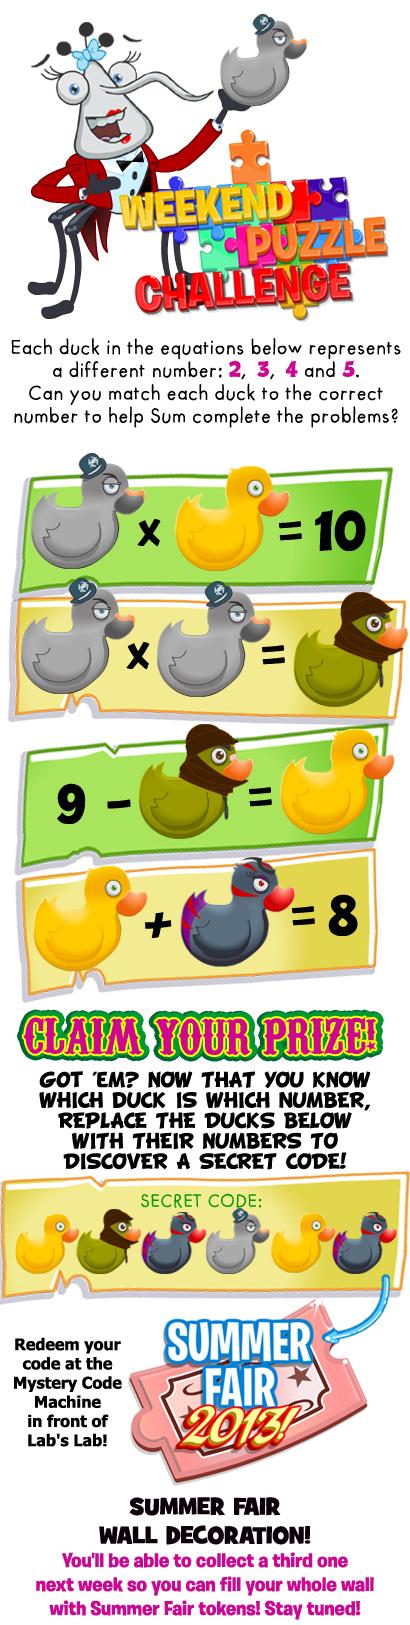 Weekend Puzzle Challenge Puzzle 2